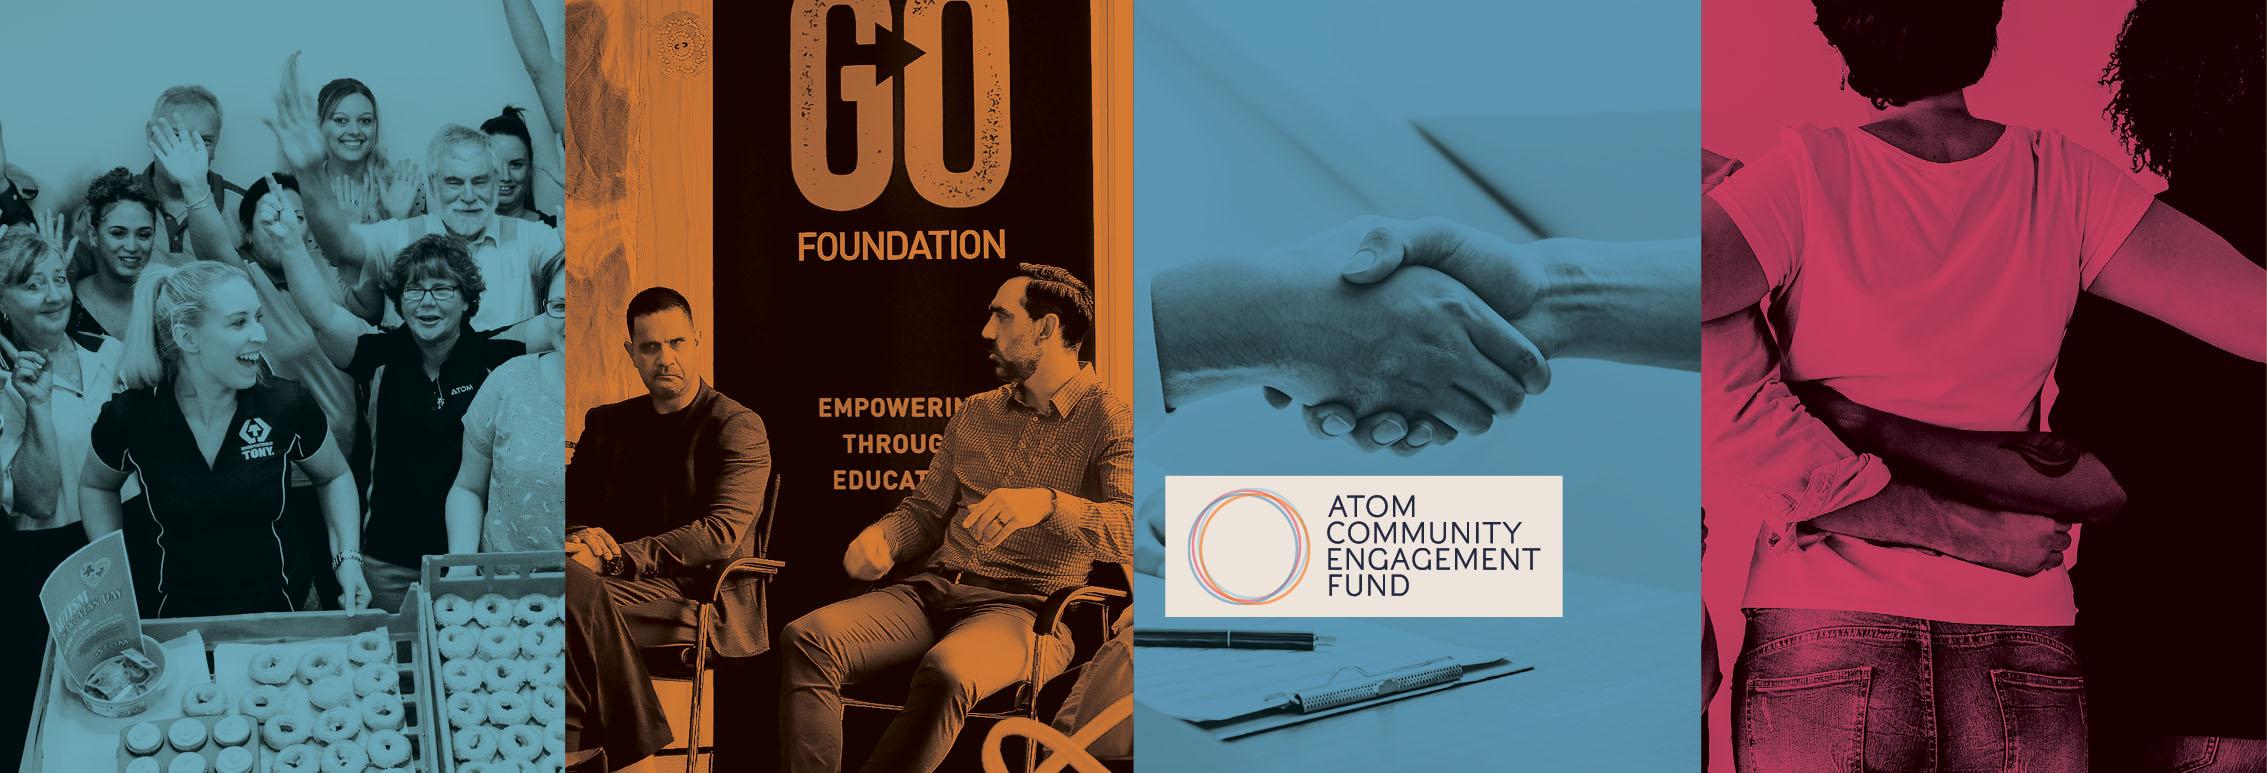 ATOM Community Engagement Fund